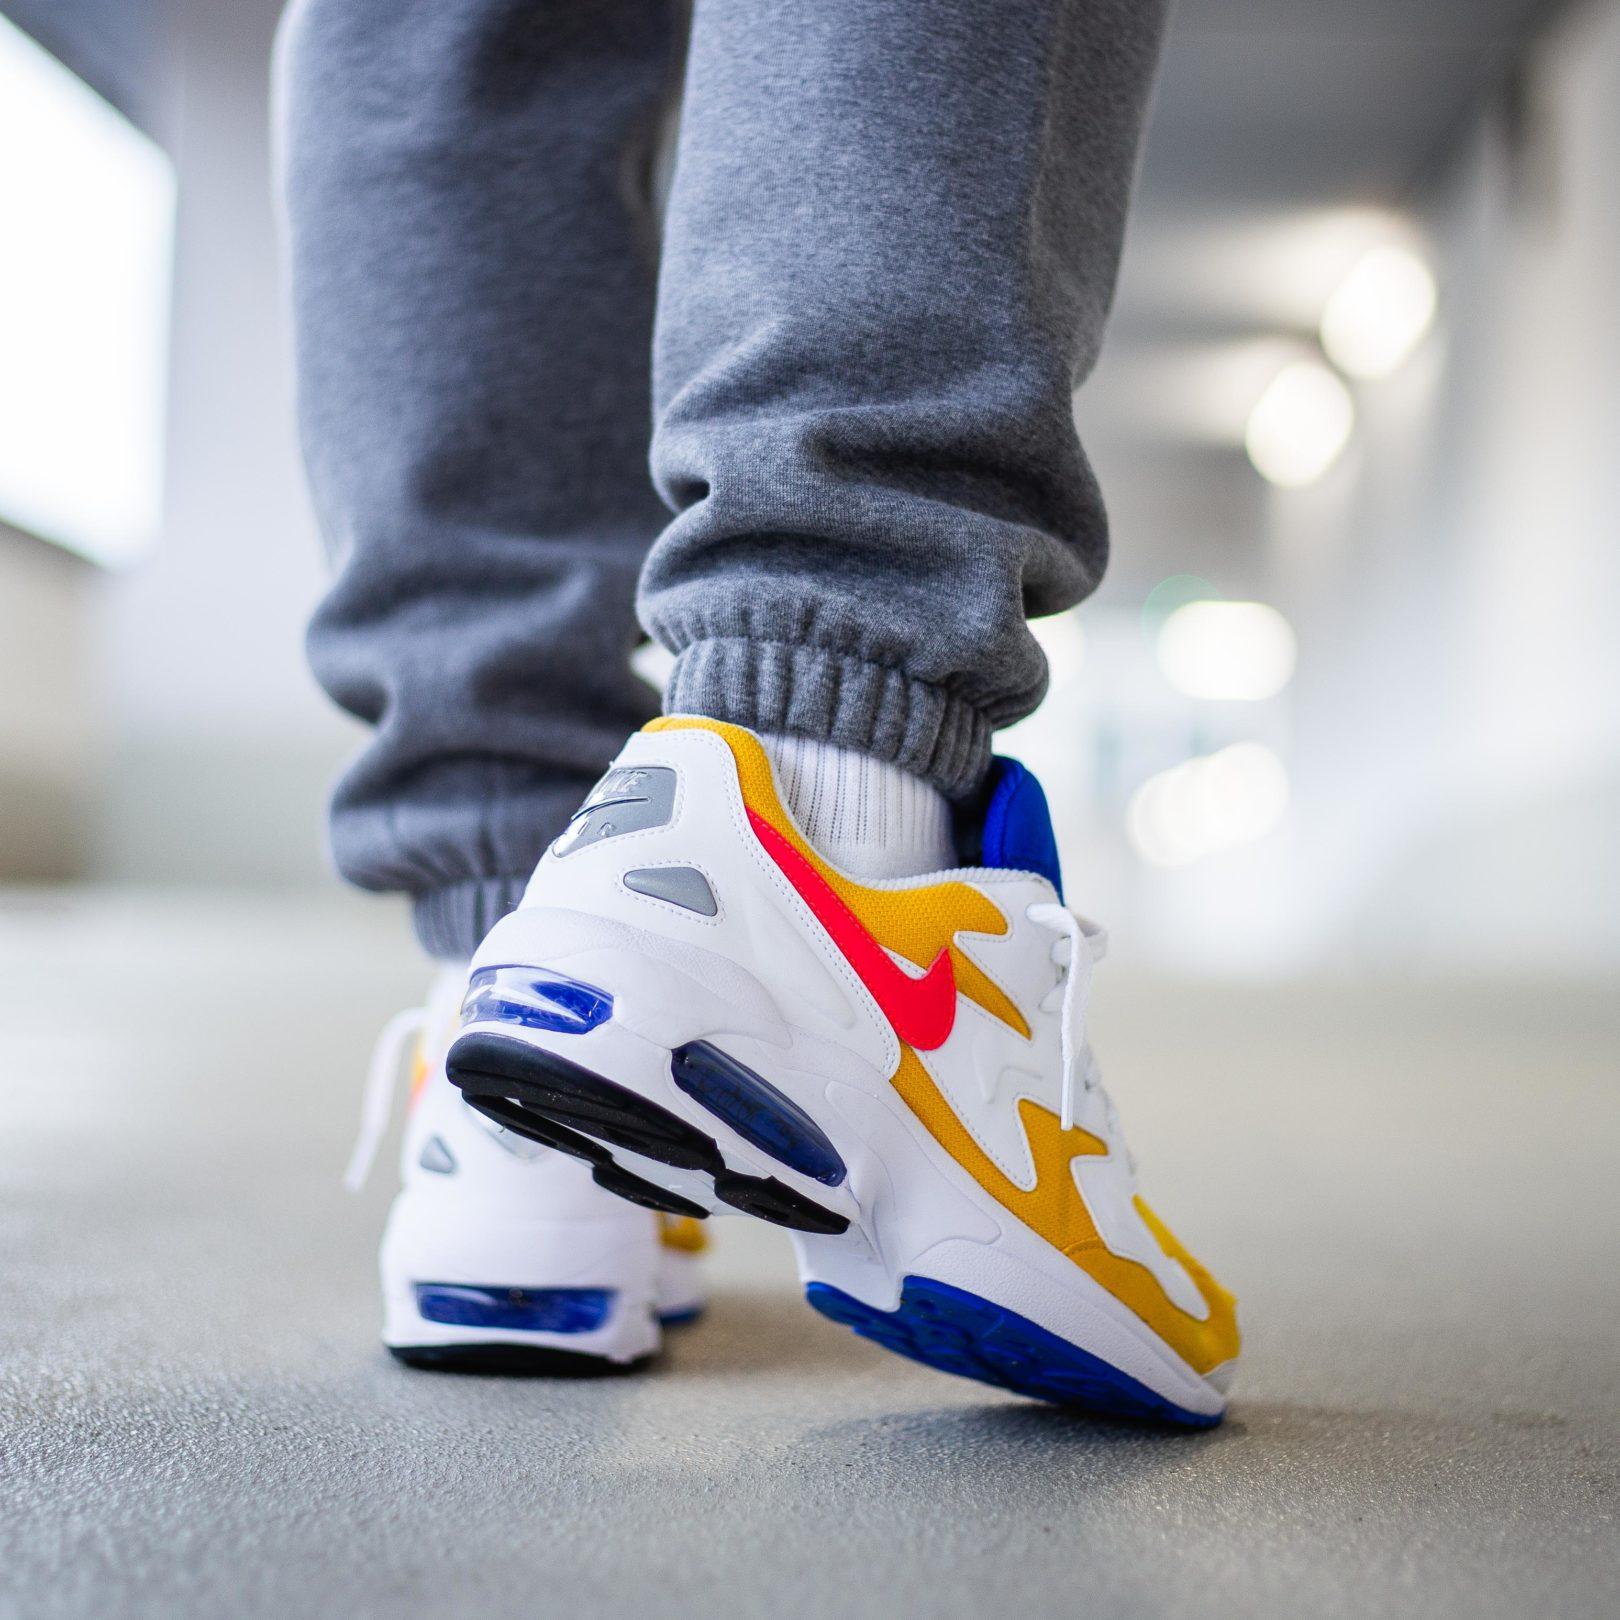 Nike Air Max 2 Light On-Feet